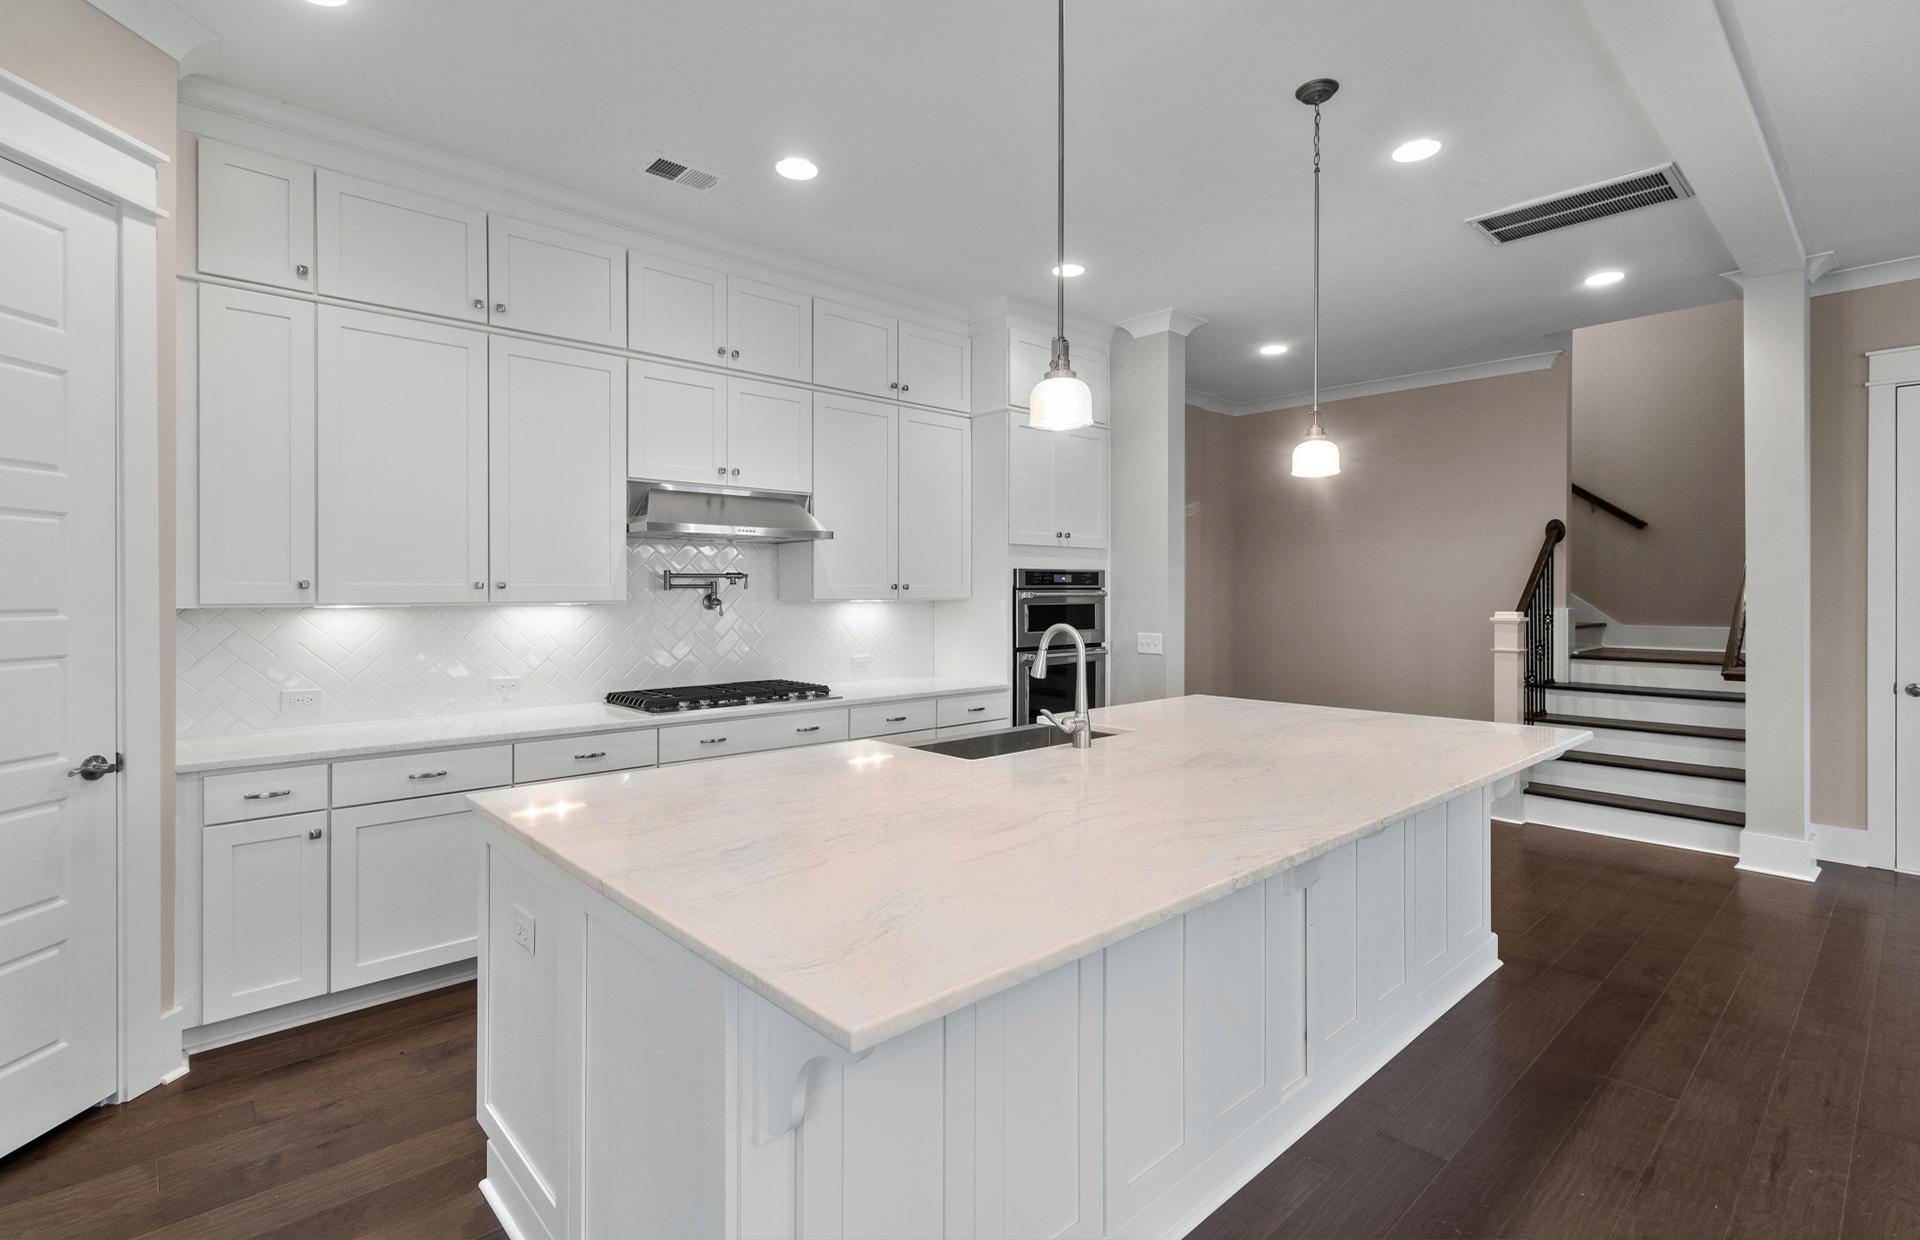 Dunes West Homes For Sale - 2320 Bucktail, Mount Pleasant, SC - 1